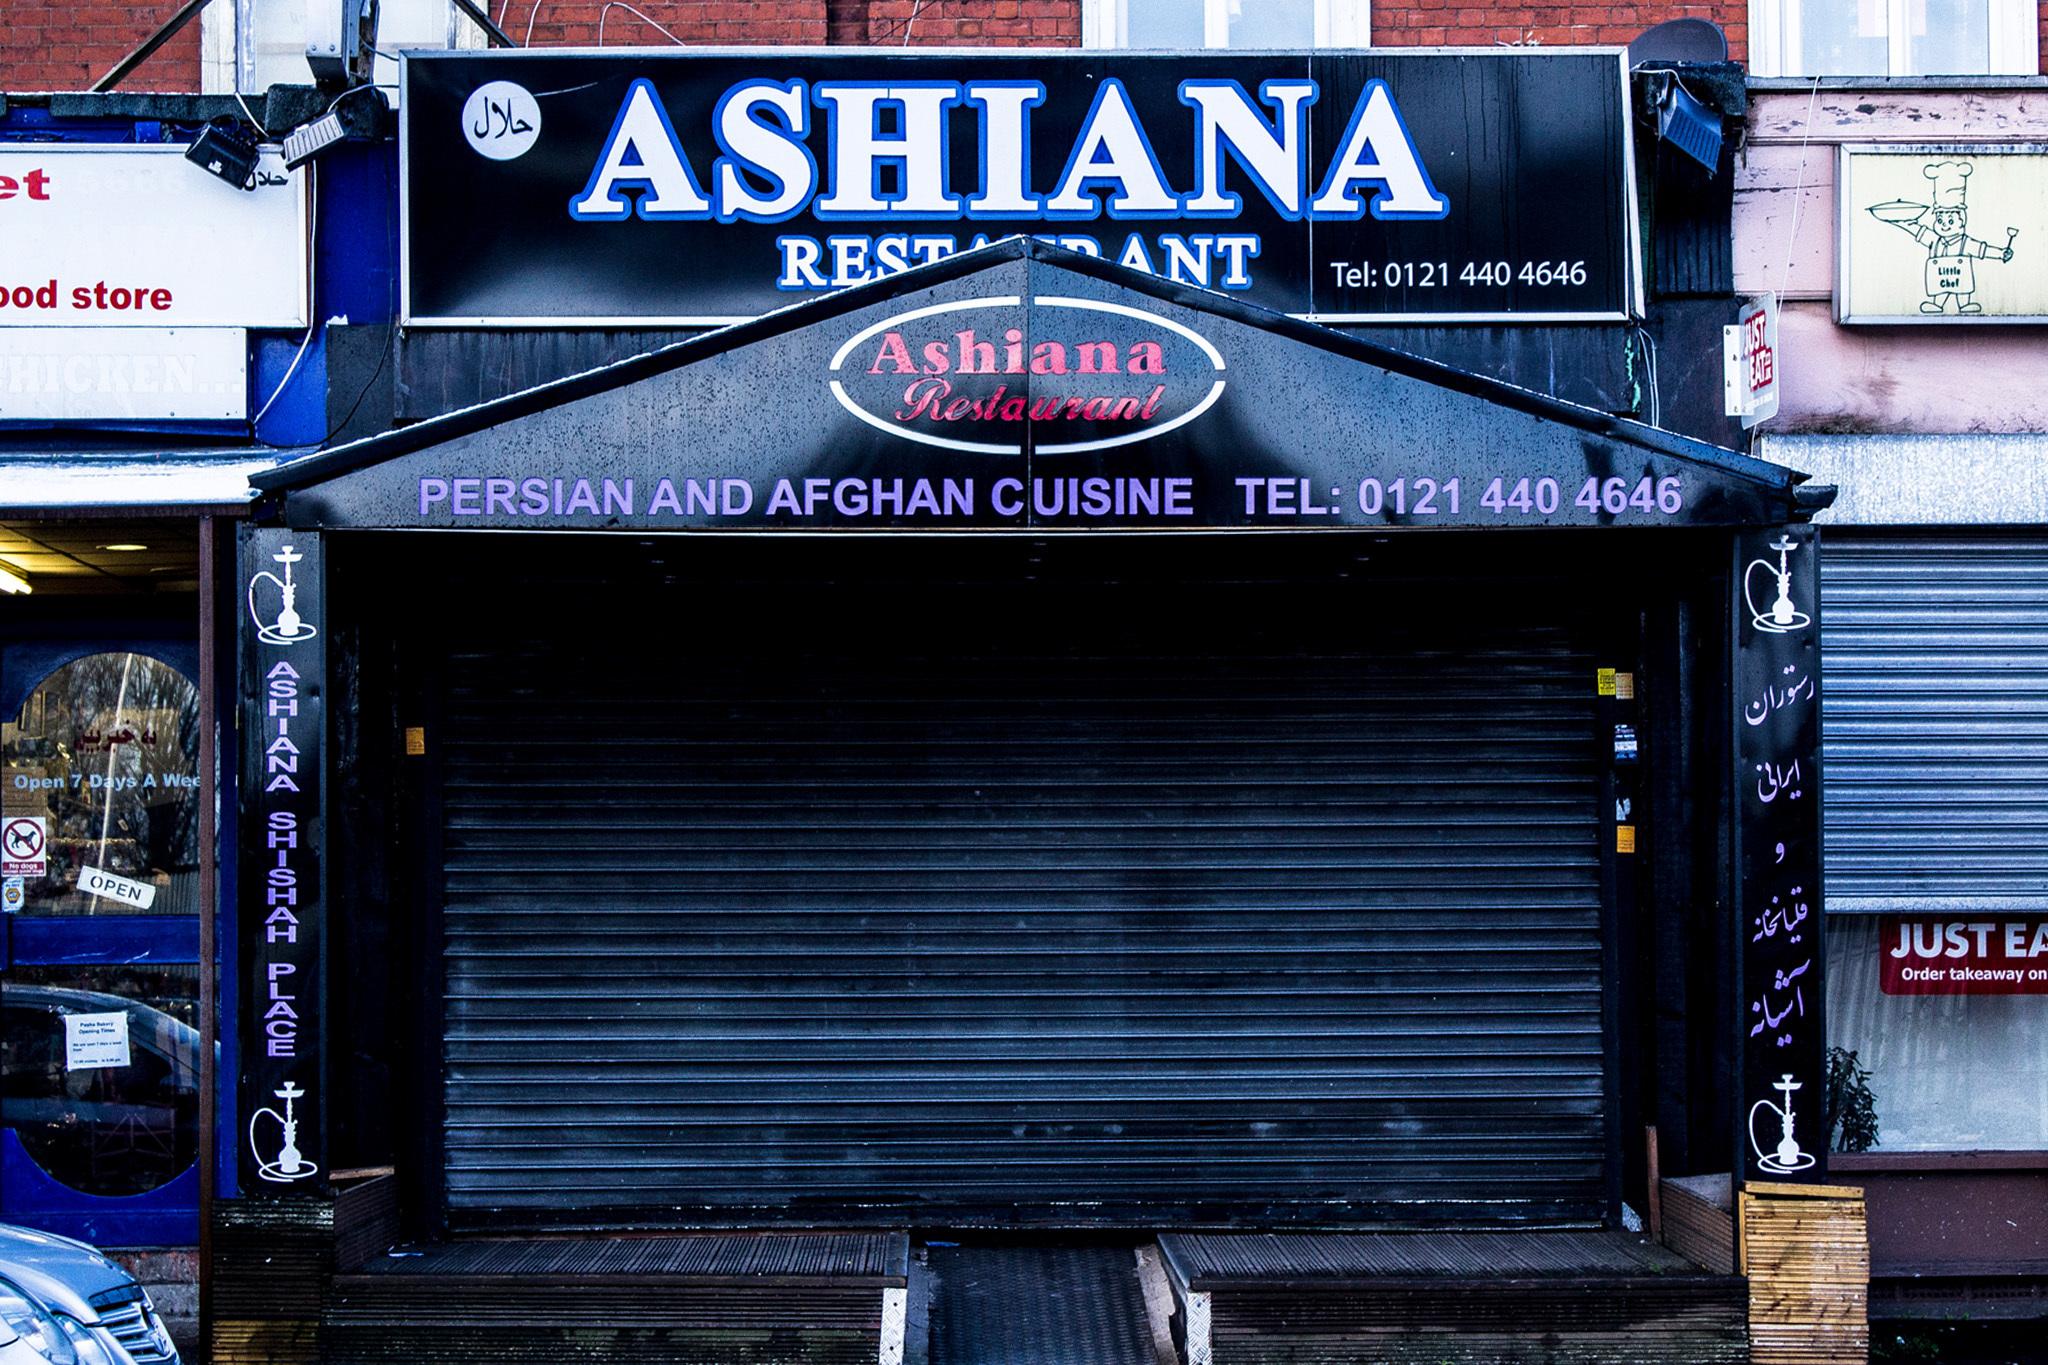 ashiana, cheap eats